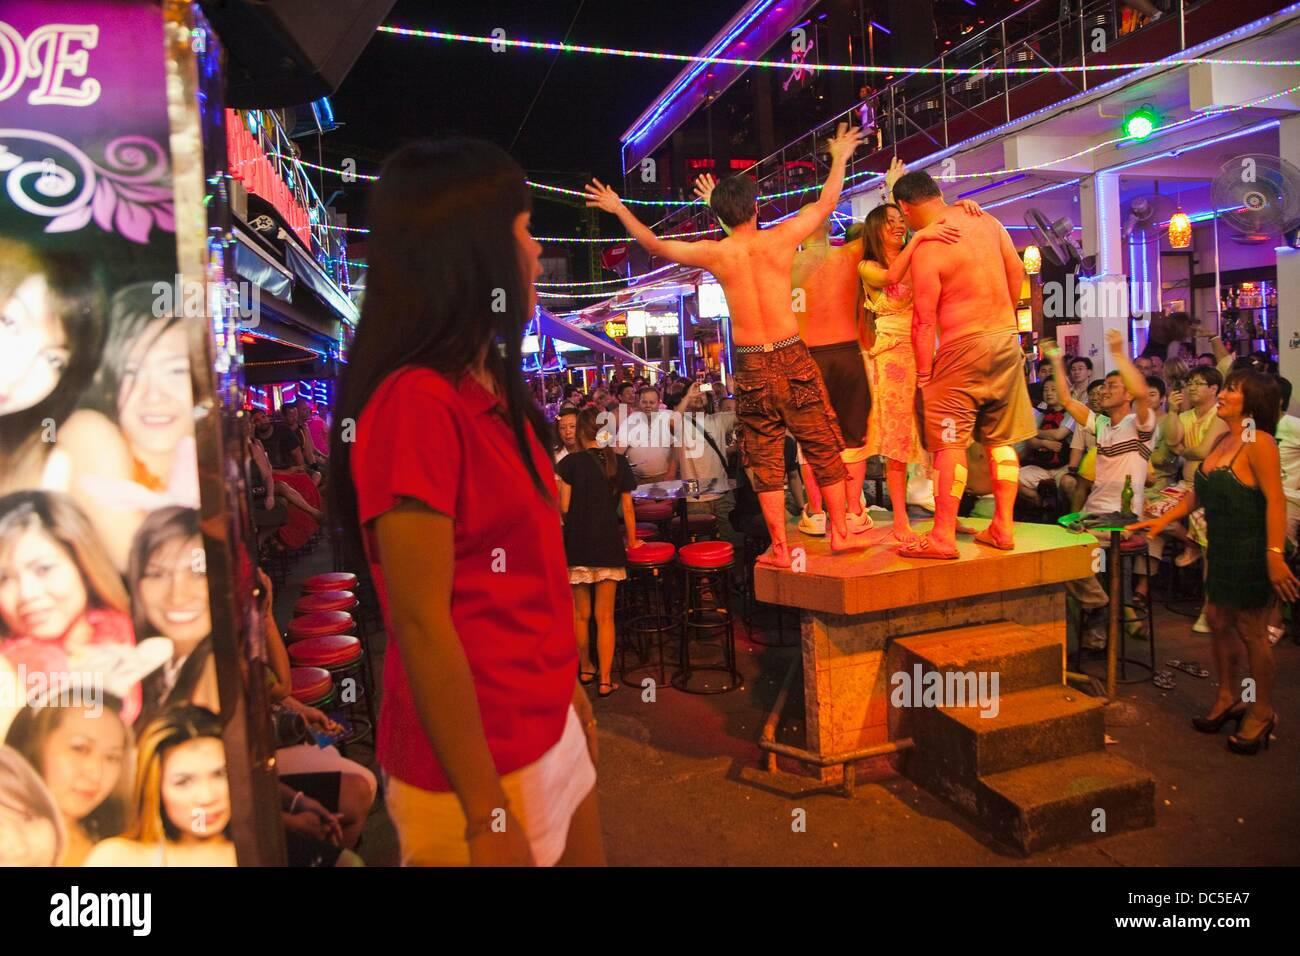 Nachtleben-Lady und Ladyboys Blanga Straße Patong Phuket Thailand. Stockbild